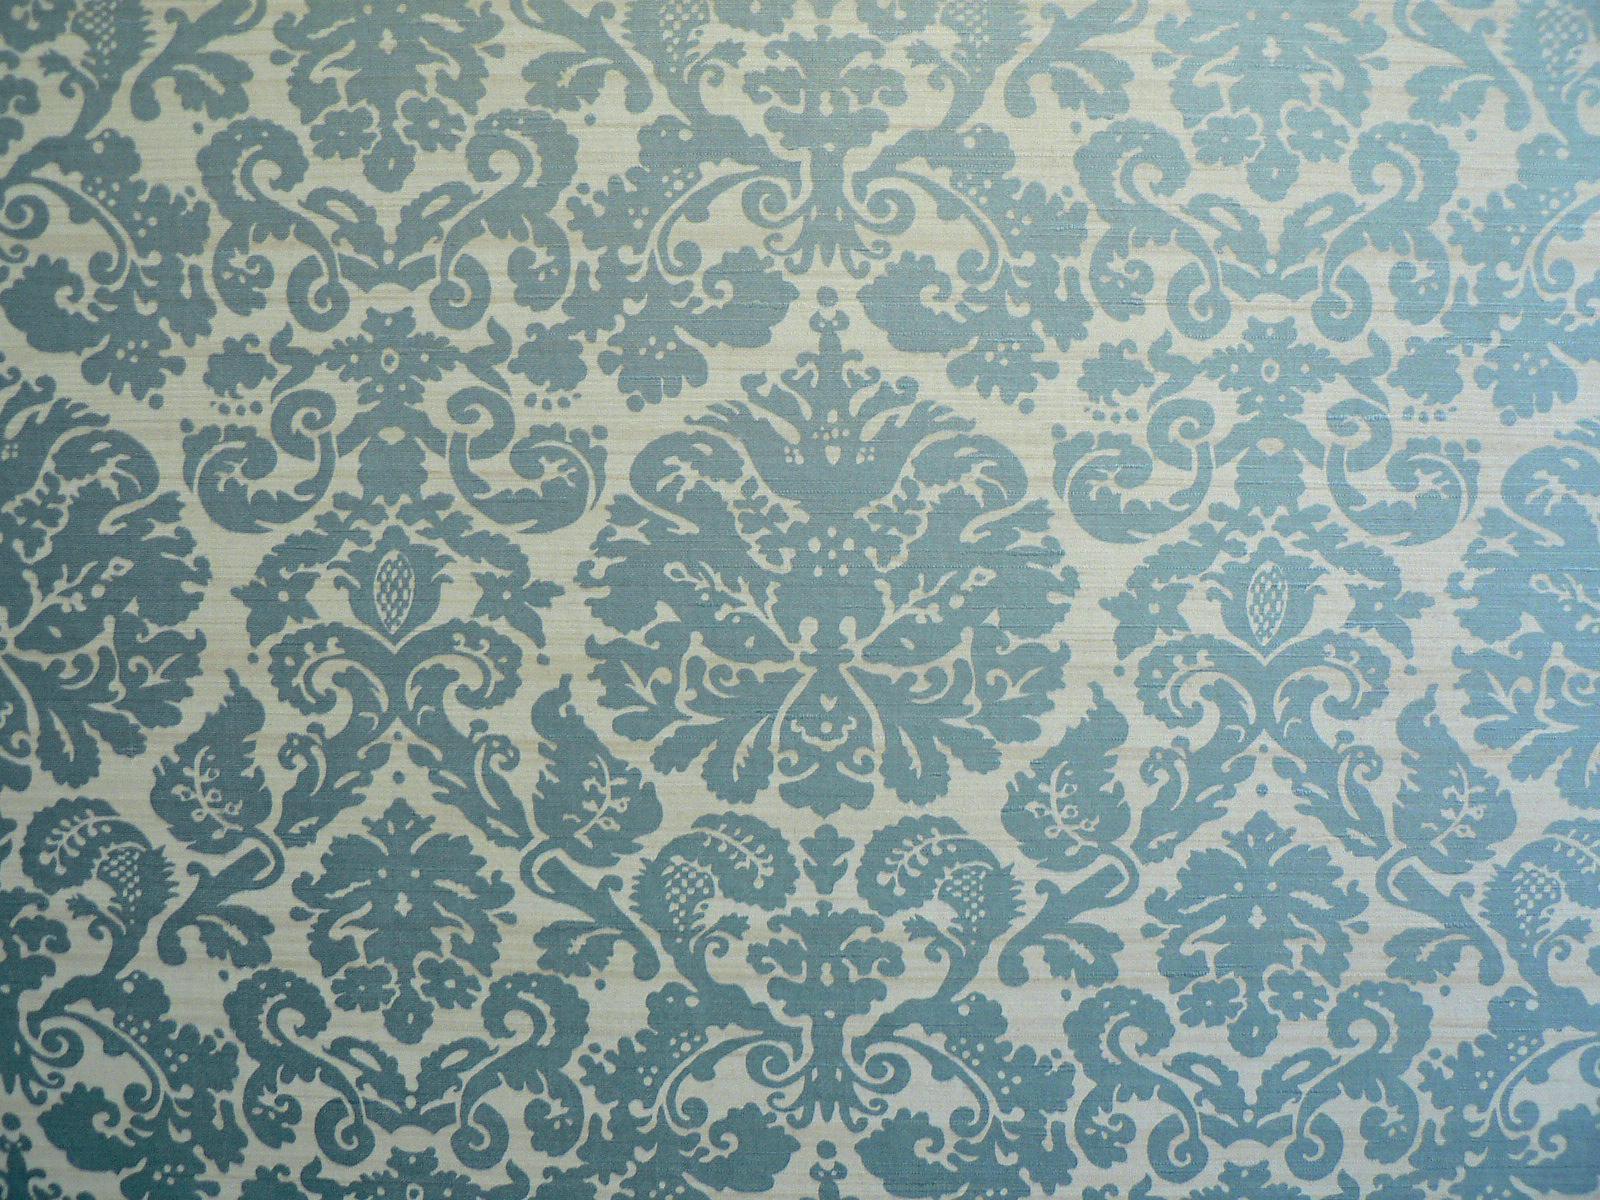 Wallpaper patterns SingSurf Interactive Geometry Richard Morris